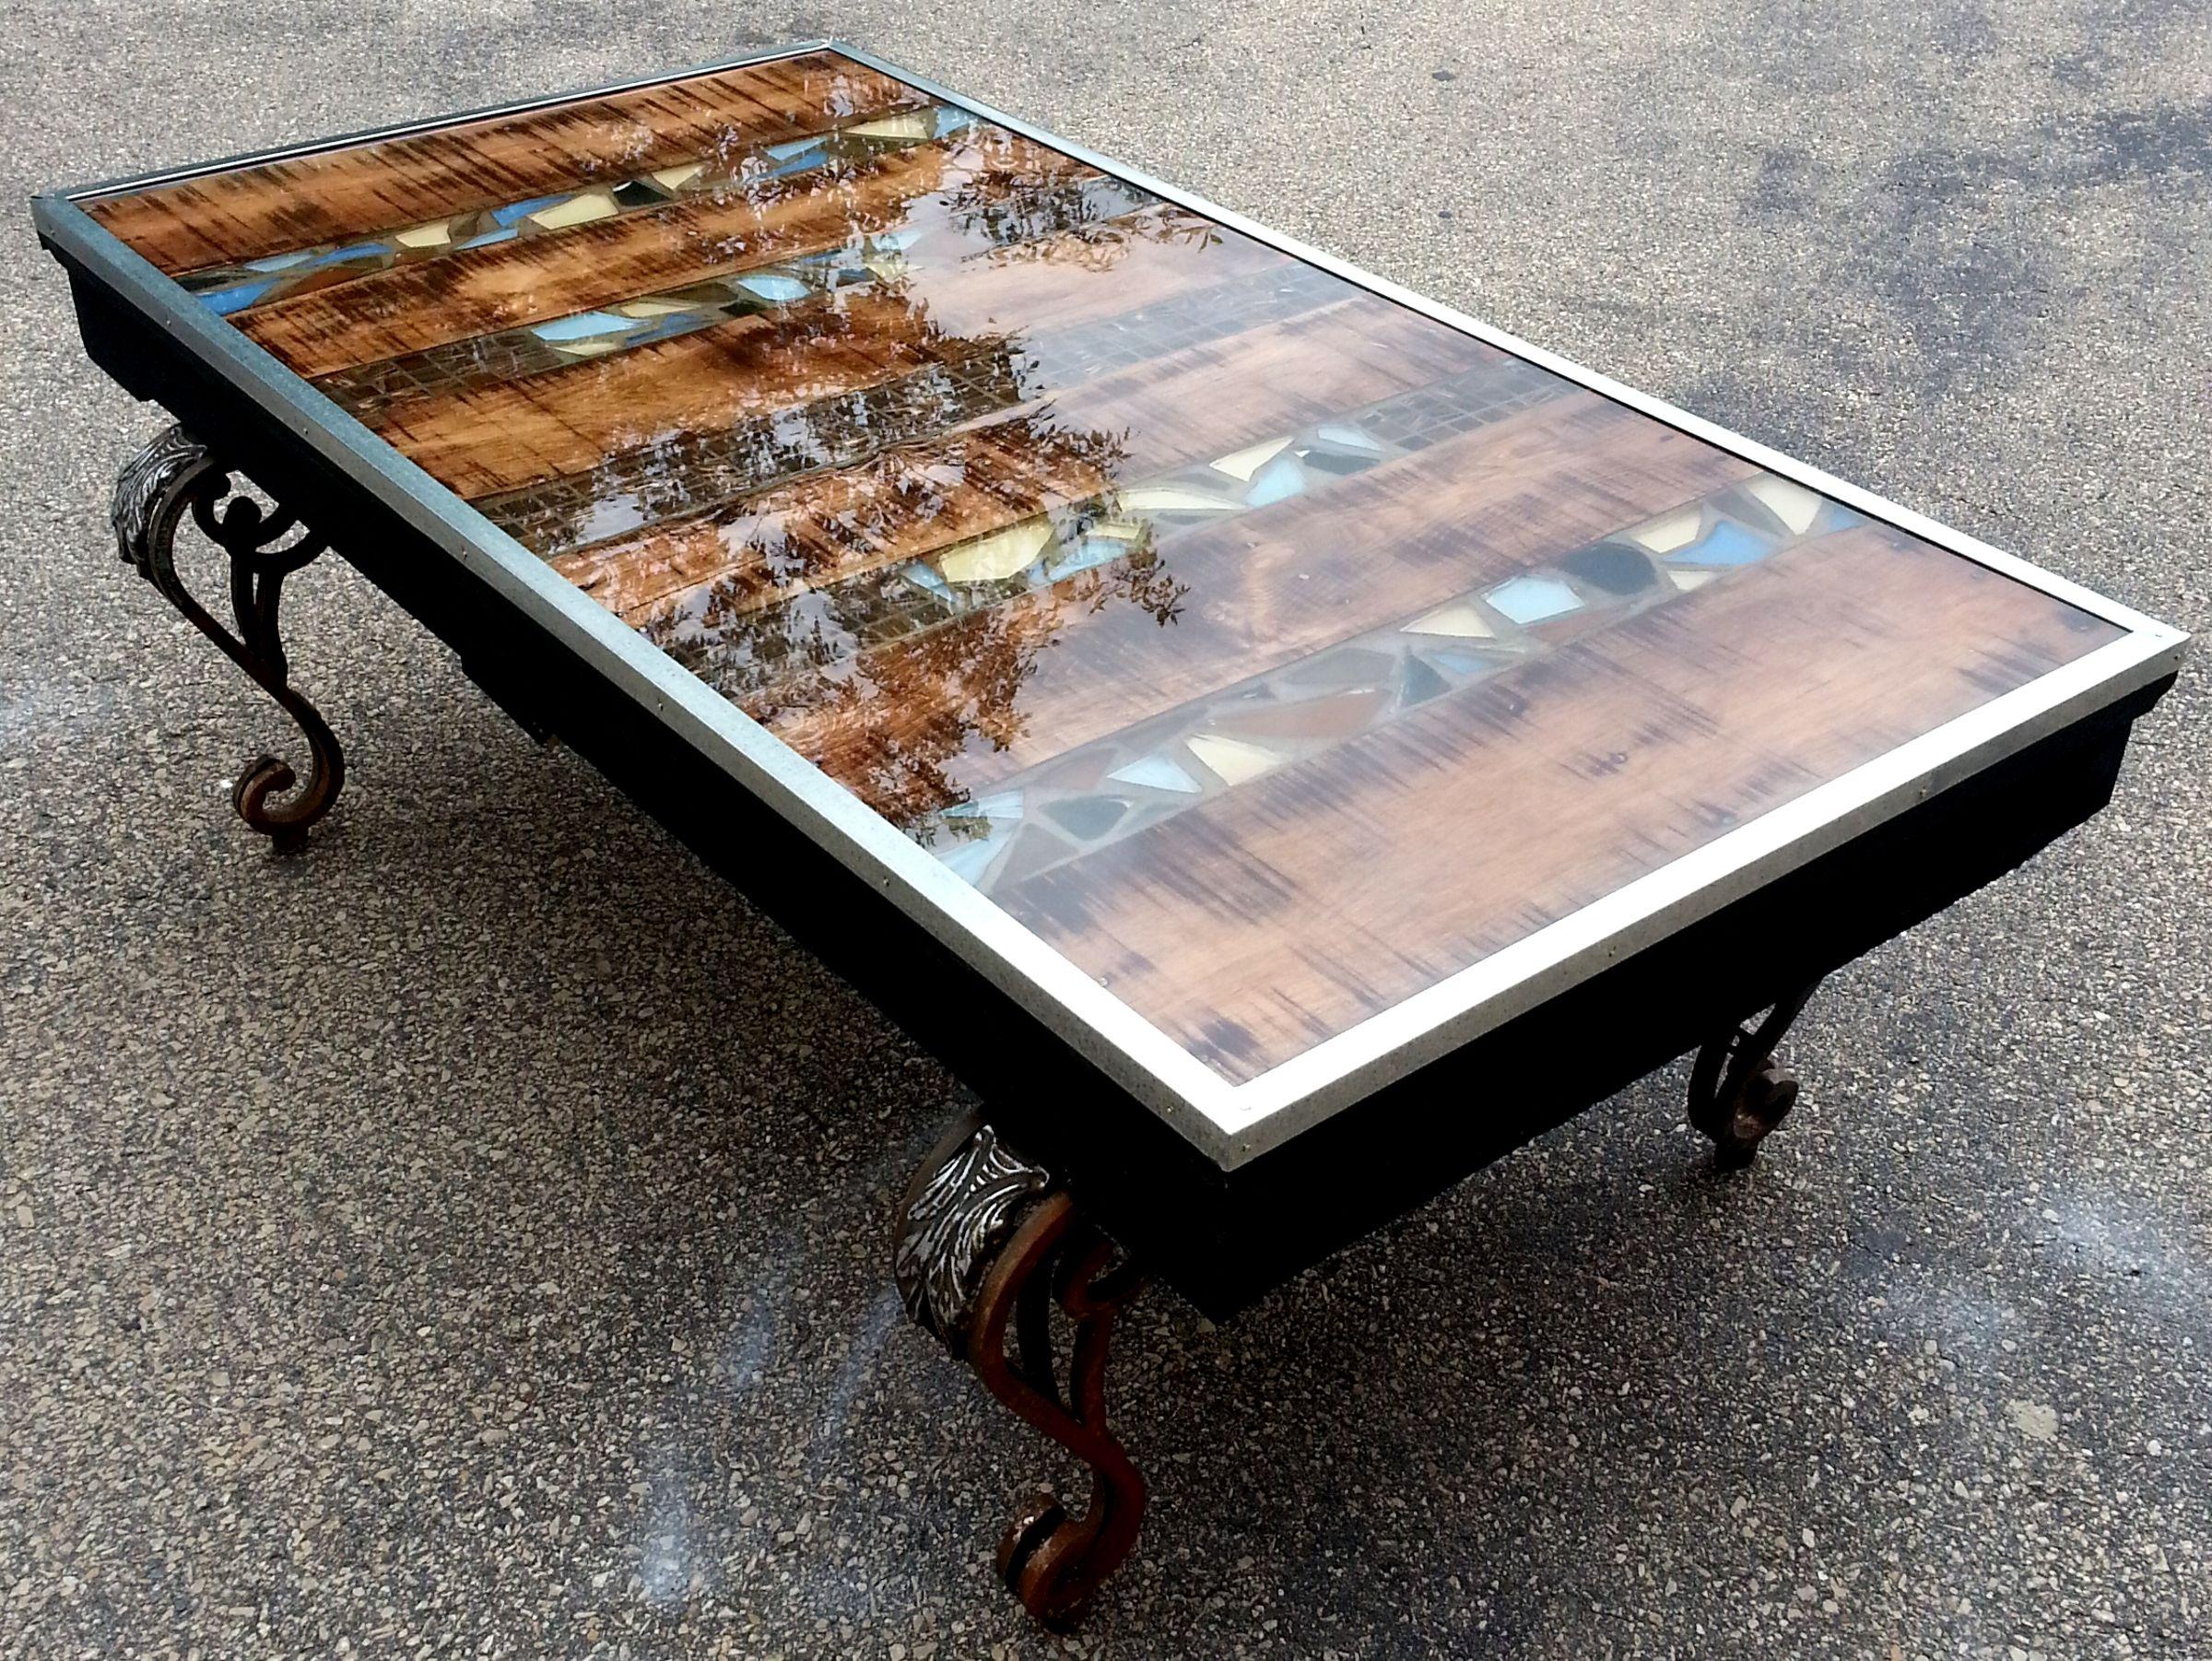 Decorative 48 X 28 Coffee Table Created With The Use Of A Pallet Broken Pieces Of Ceramic Tile Repurposed Metal Legs From A Dif Tafels Doe Het Zelf Keramiek [ 1802 x 2400 Pixel ]